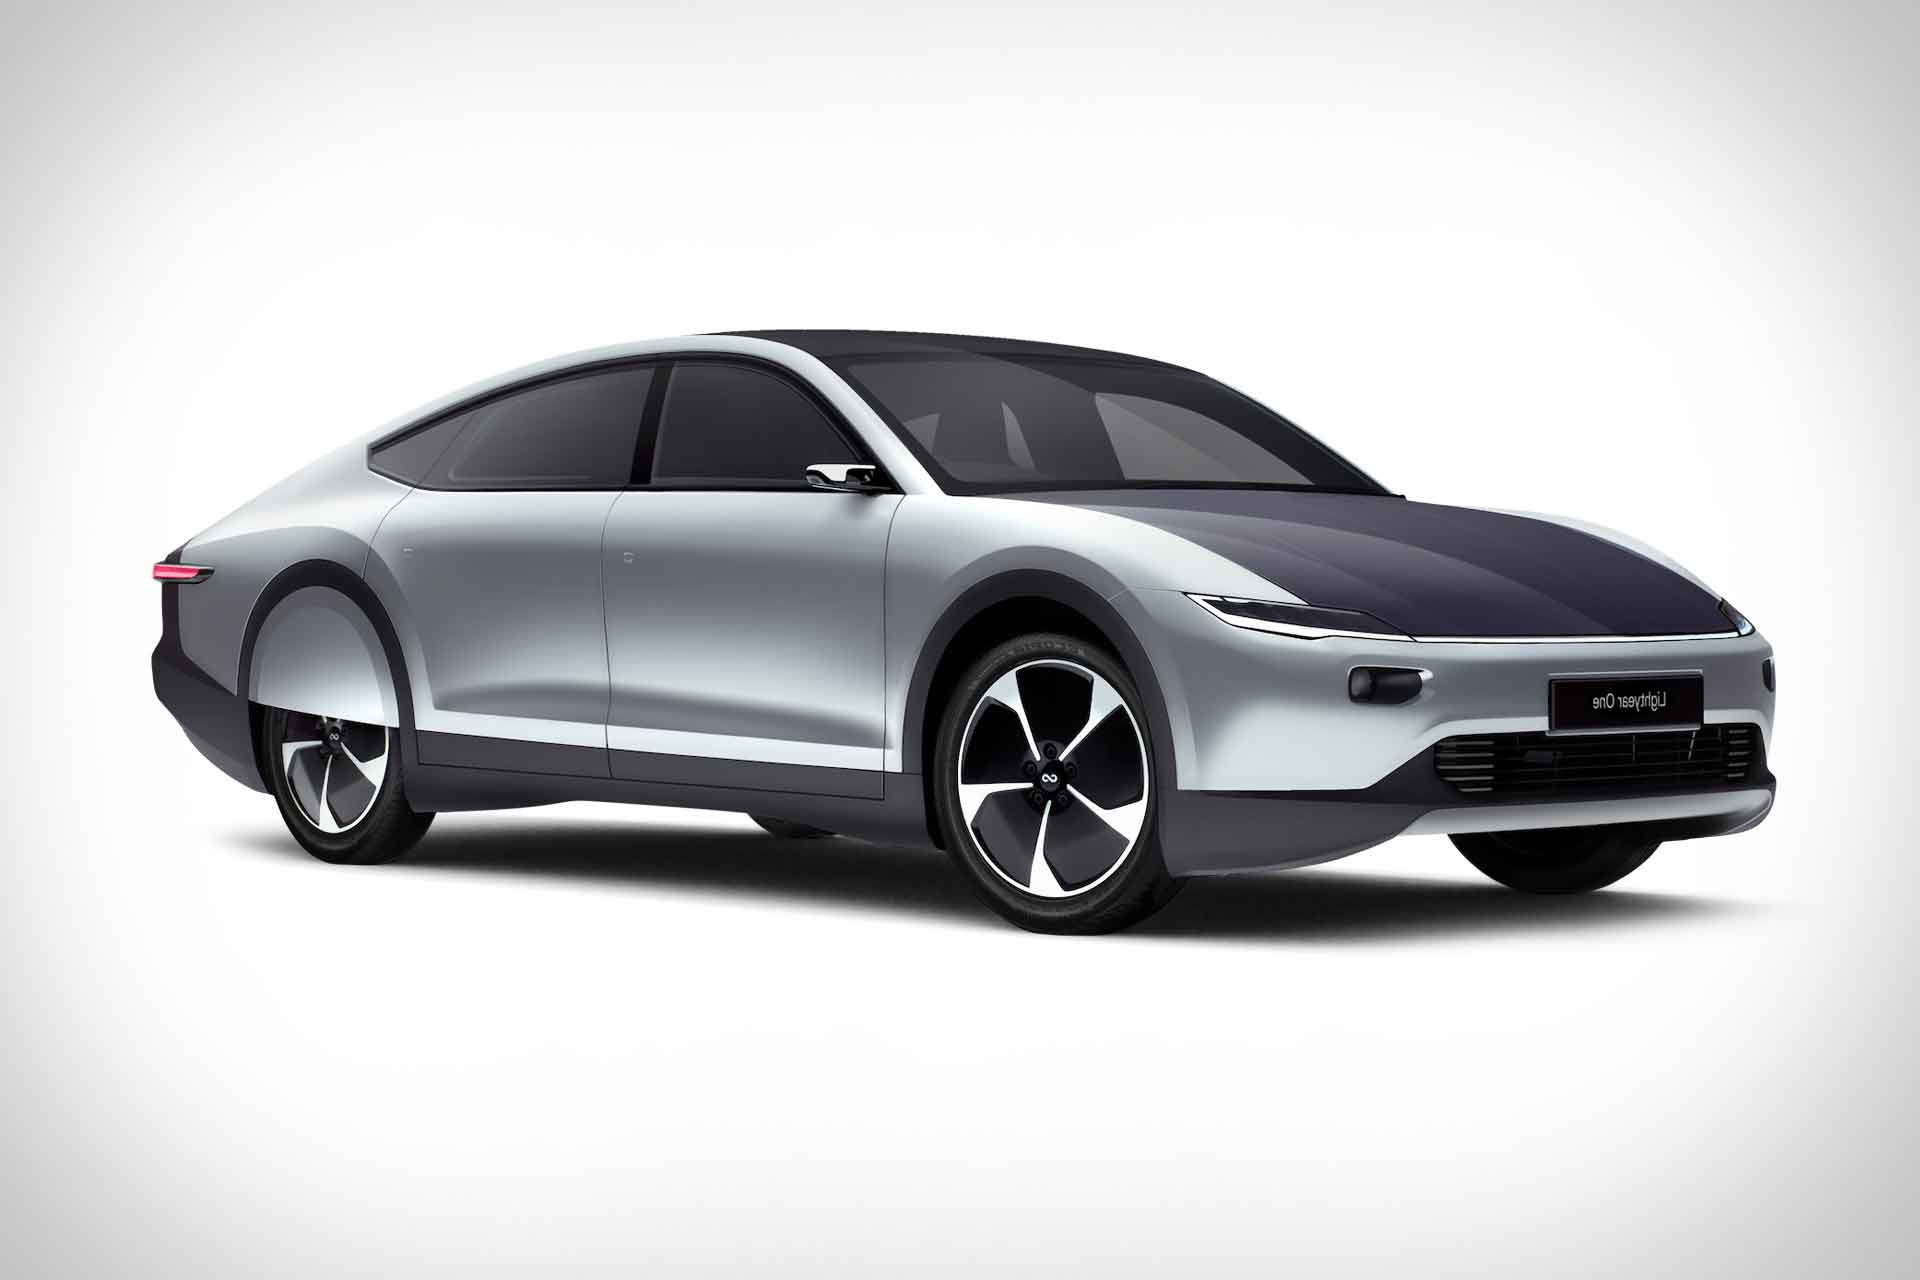 Lightyear One Solar Electric Sedan